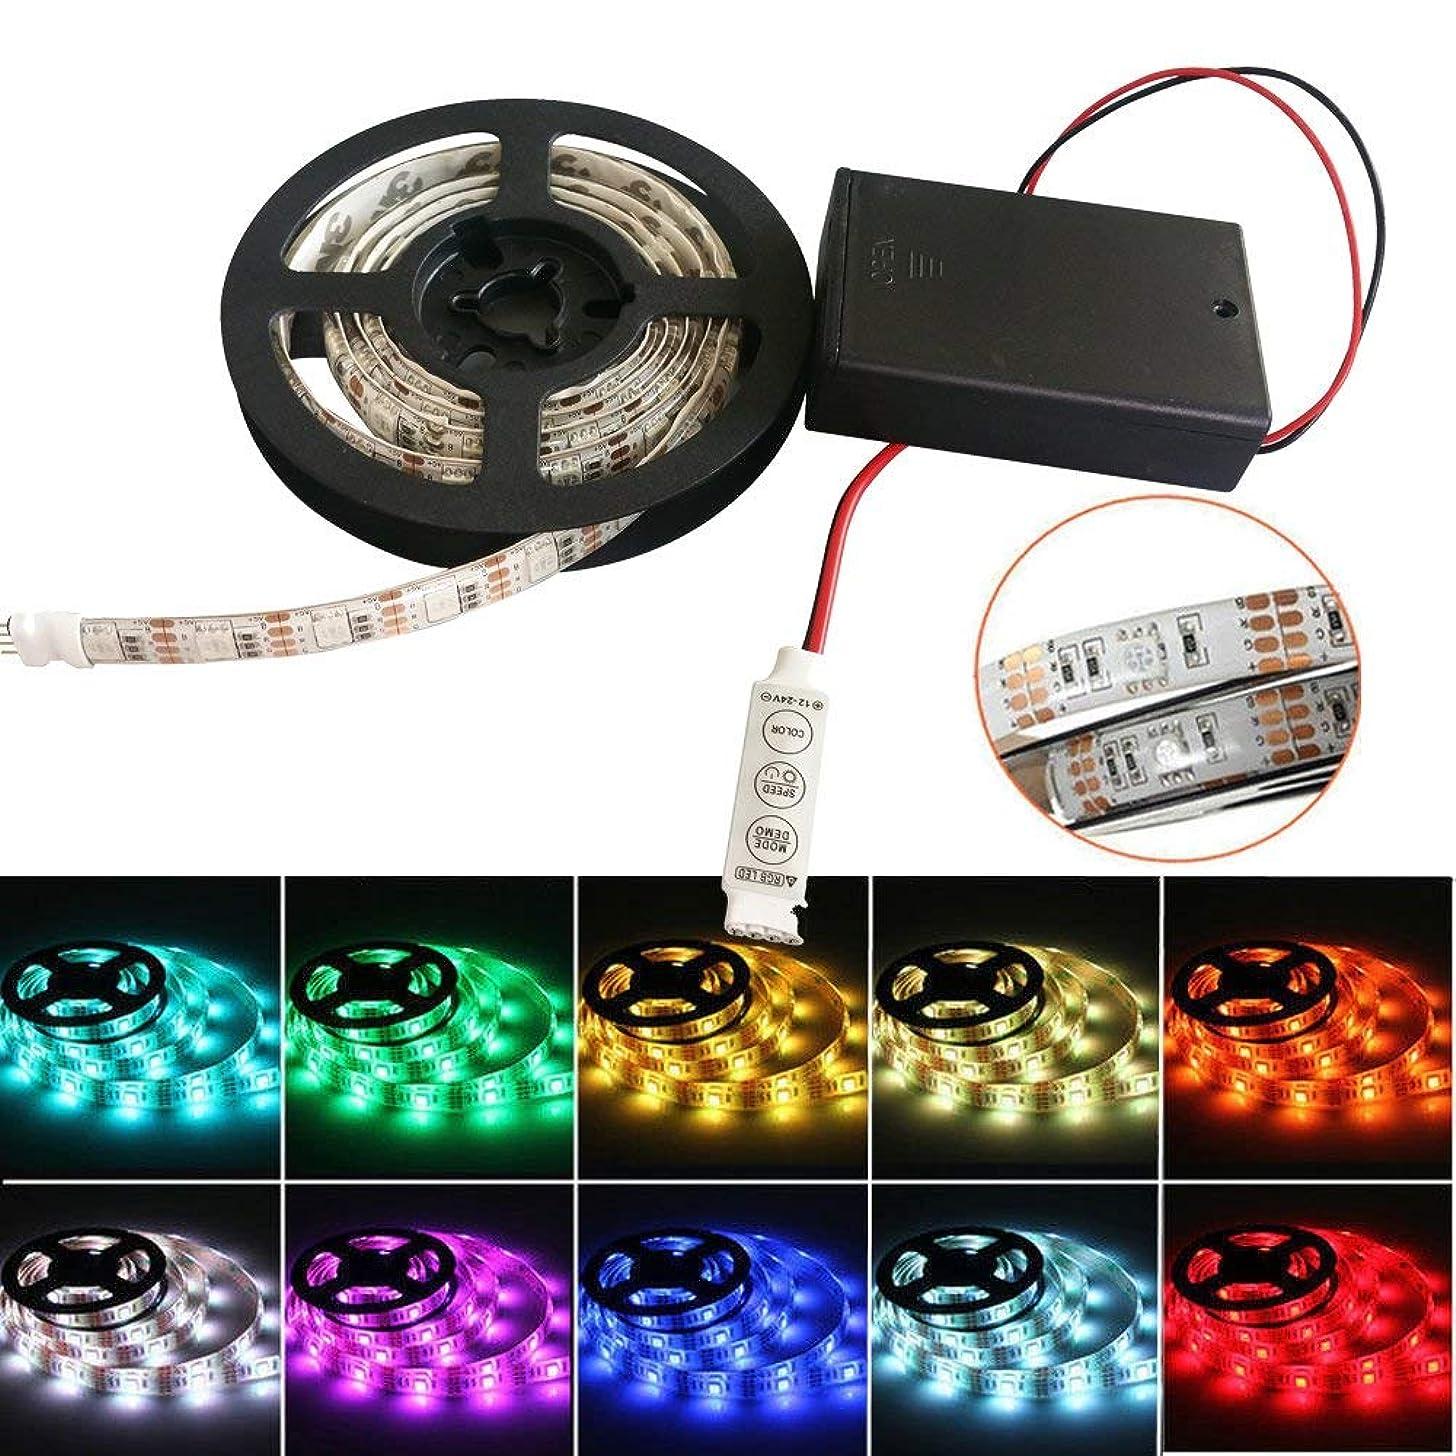 iNextStation LED Strip Light Battery Powered, 5V 120 Units SMD5050 LEDs Color Changing Waterproof String Light (200cm, RGB)